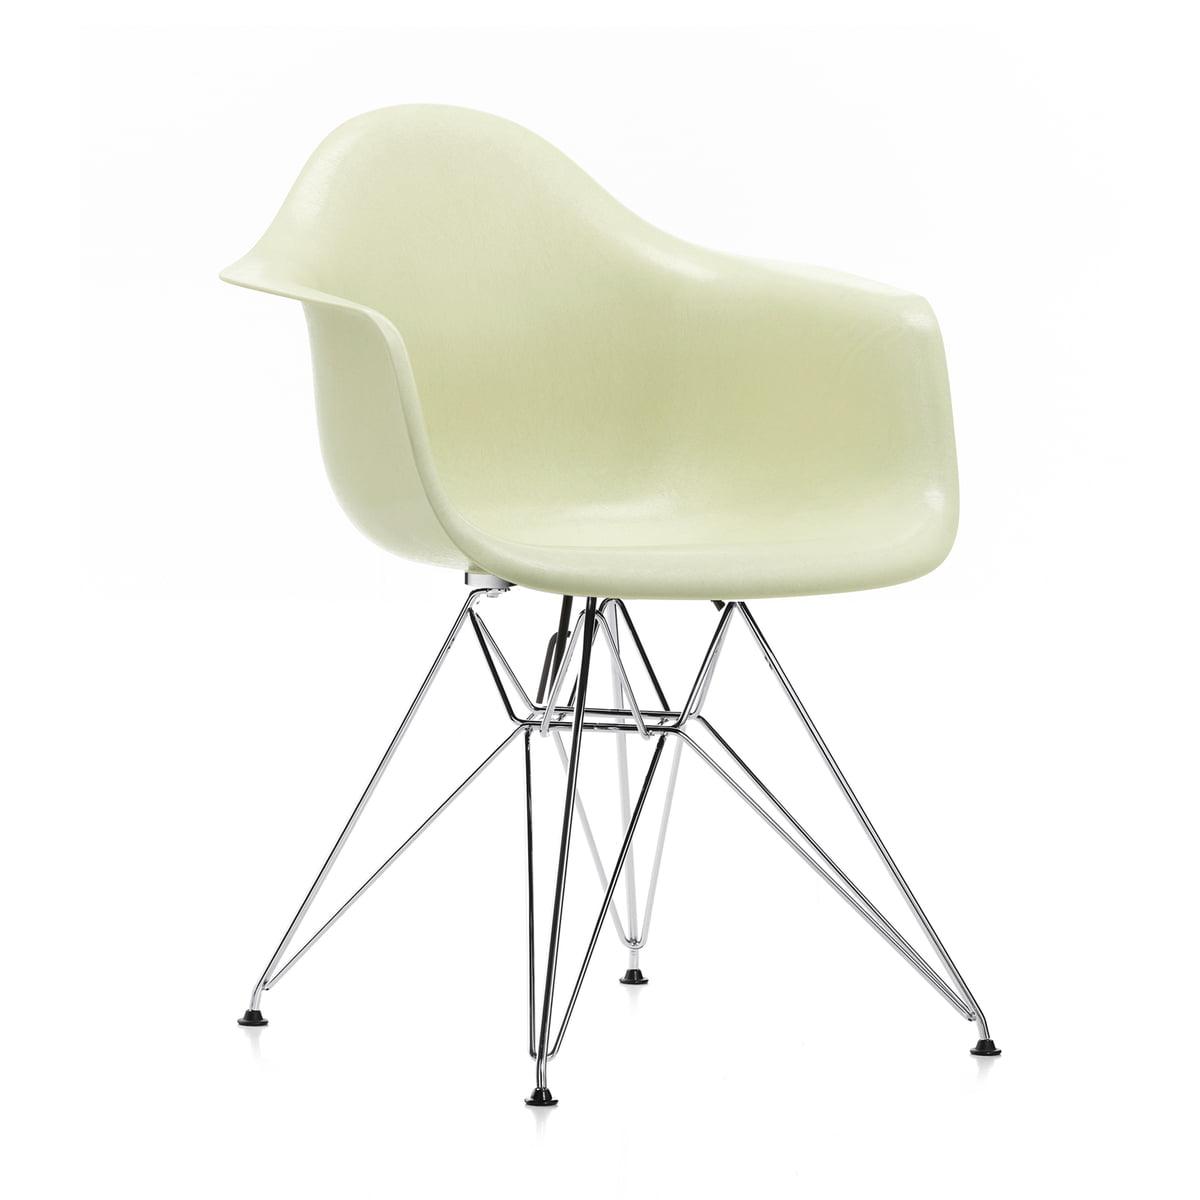 Vitra - Eames Fiberglass Armchair DAW, Ahorn gelblich / Eames sea foam green (Filzgleiter weiß)